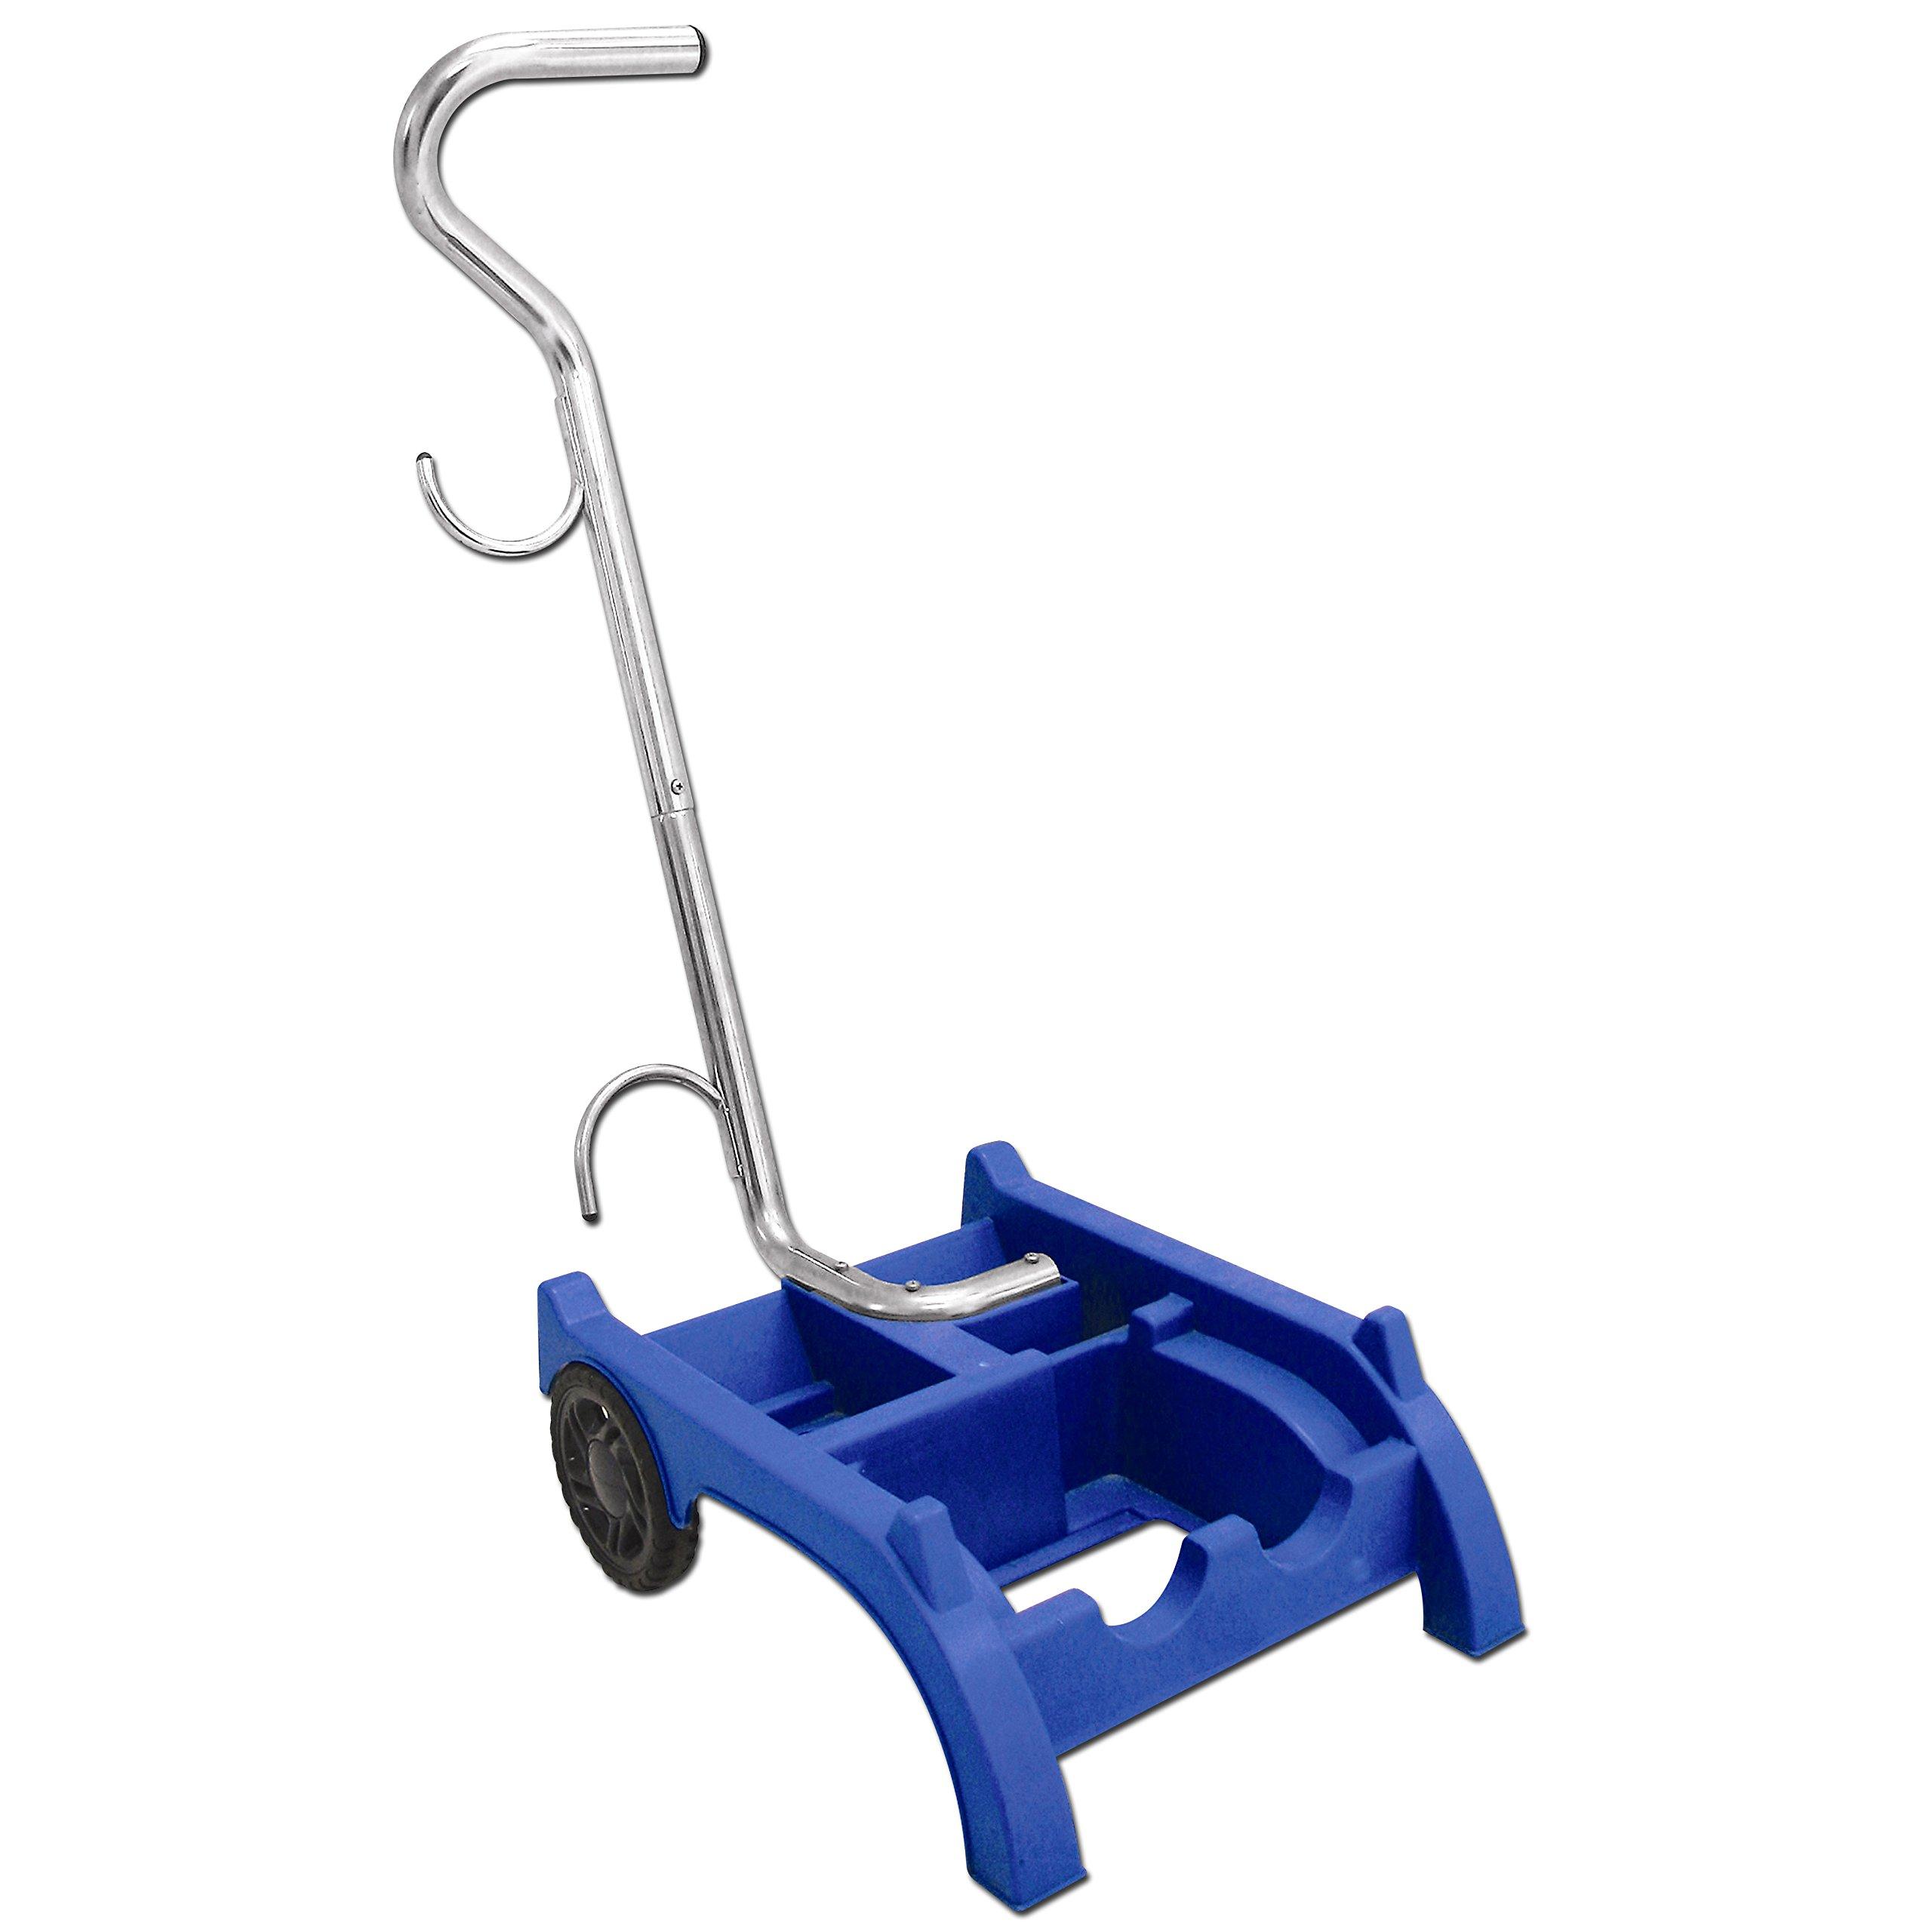 Aqua Products Caddy Cart Automatic Pool Cleaner Cart by Aqua Products